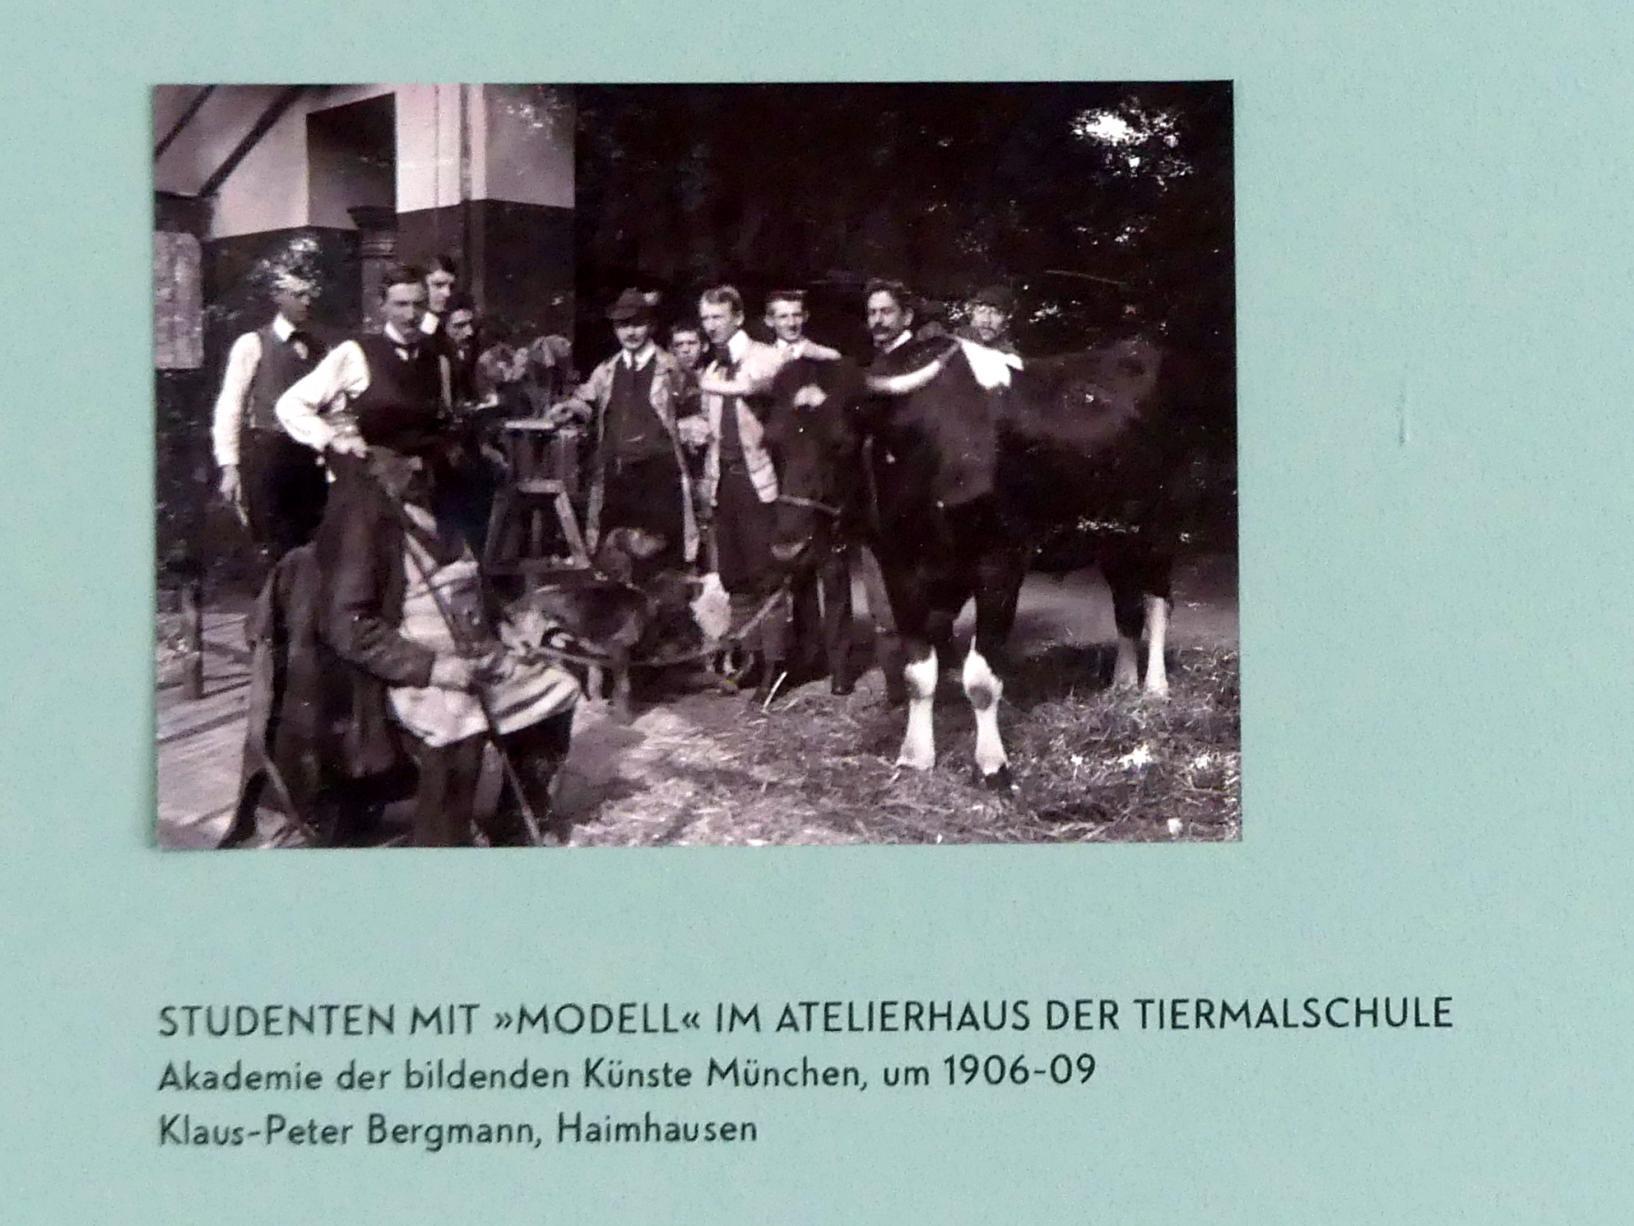 München, Lenbachhaus, Saal 24, Bild 10/14